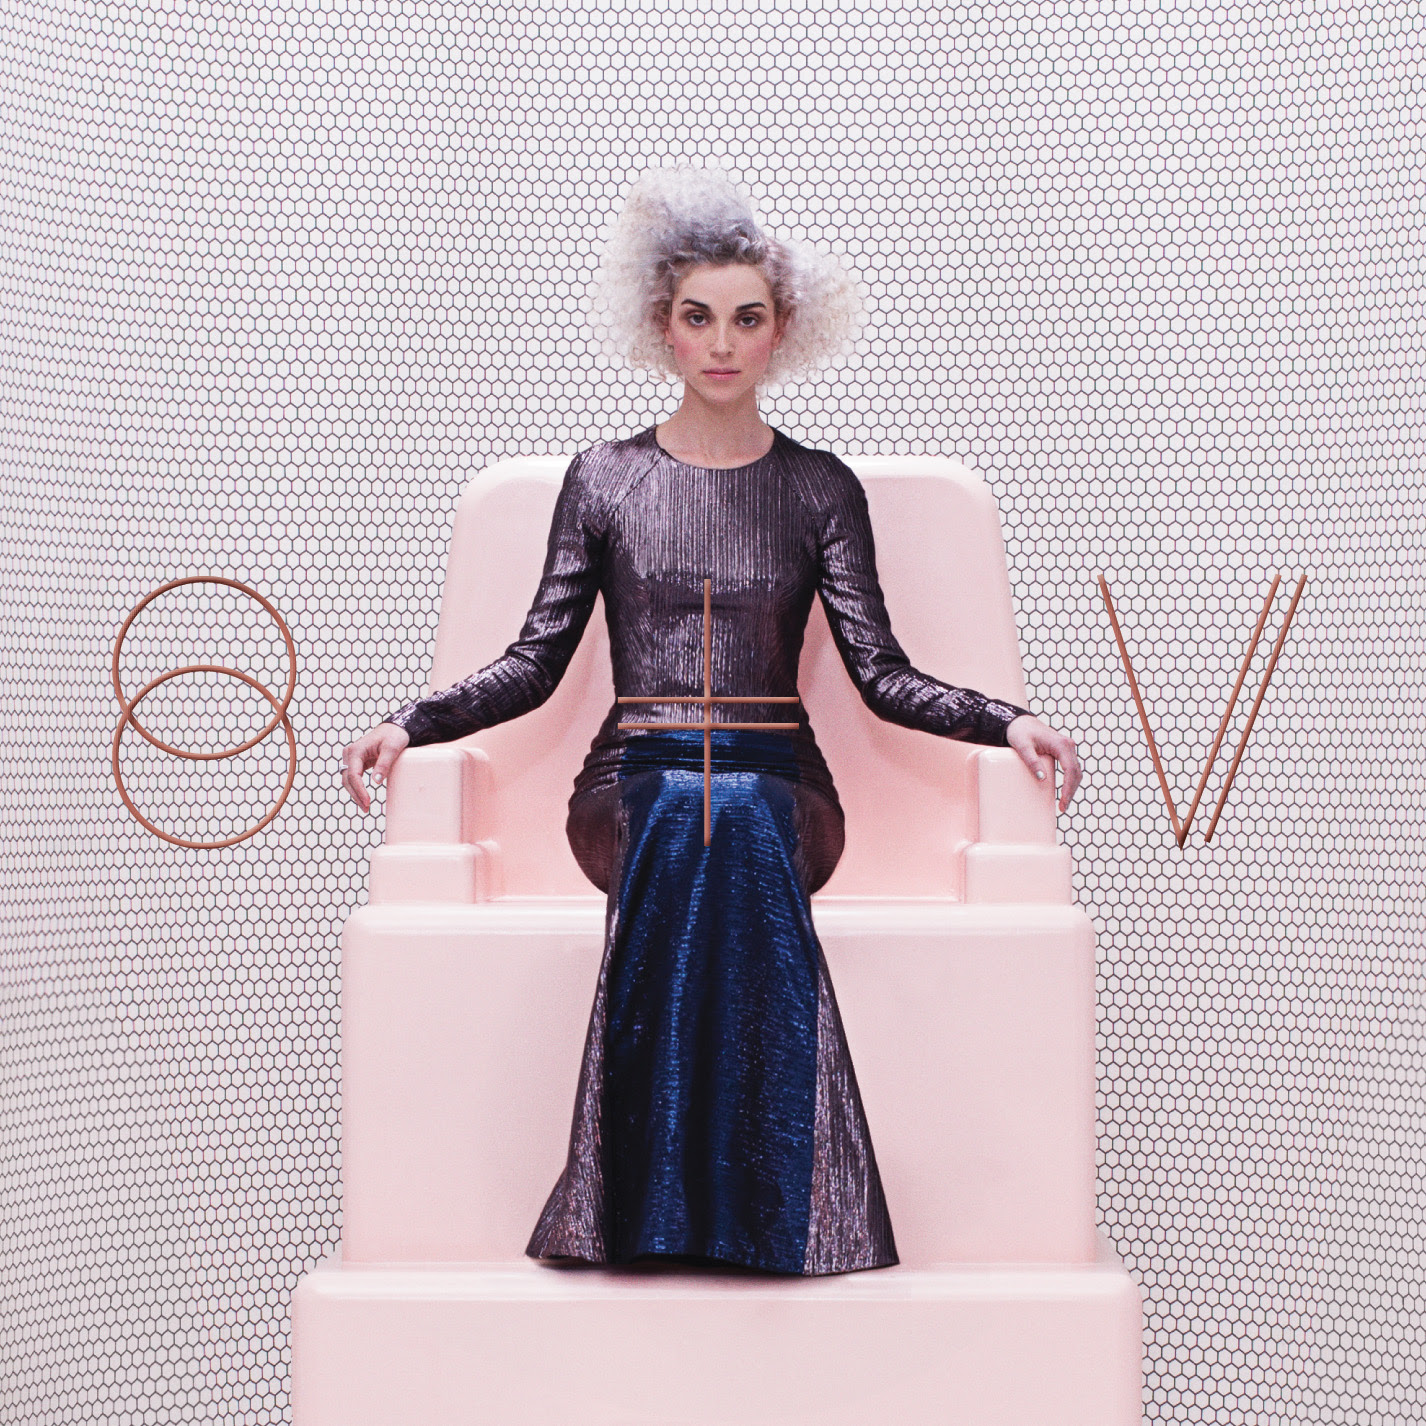 st vincent 2014 album The 50 Most Anticipated Albums of 2014